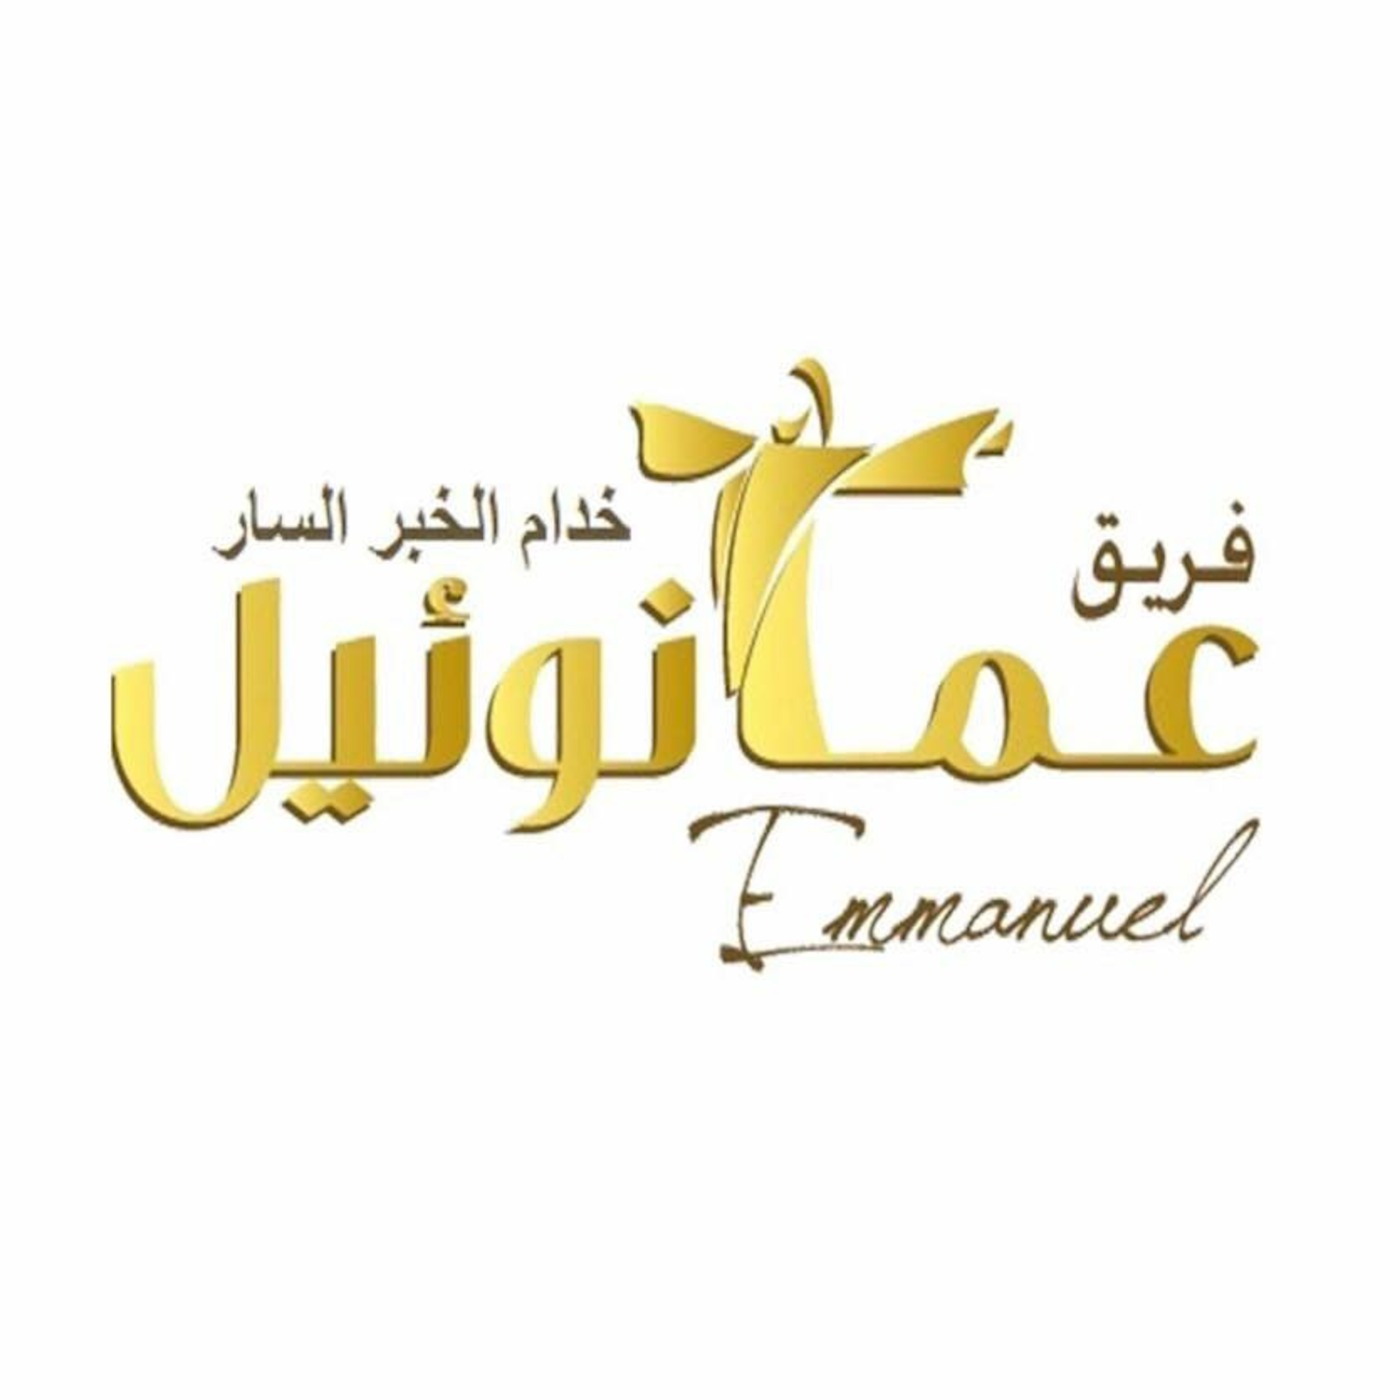 Emmanuel team Egypt - خدام الخبر السار